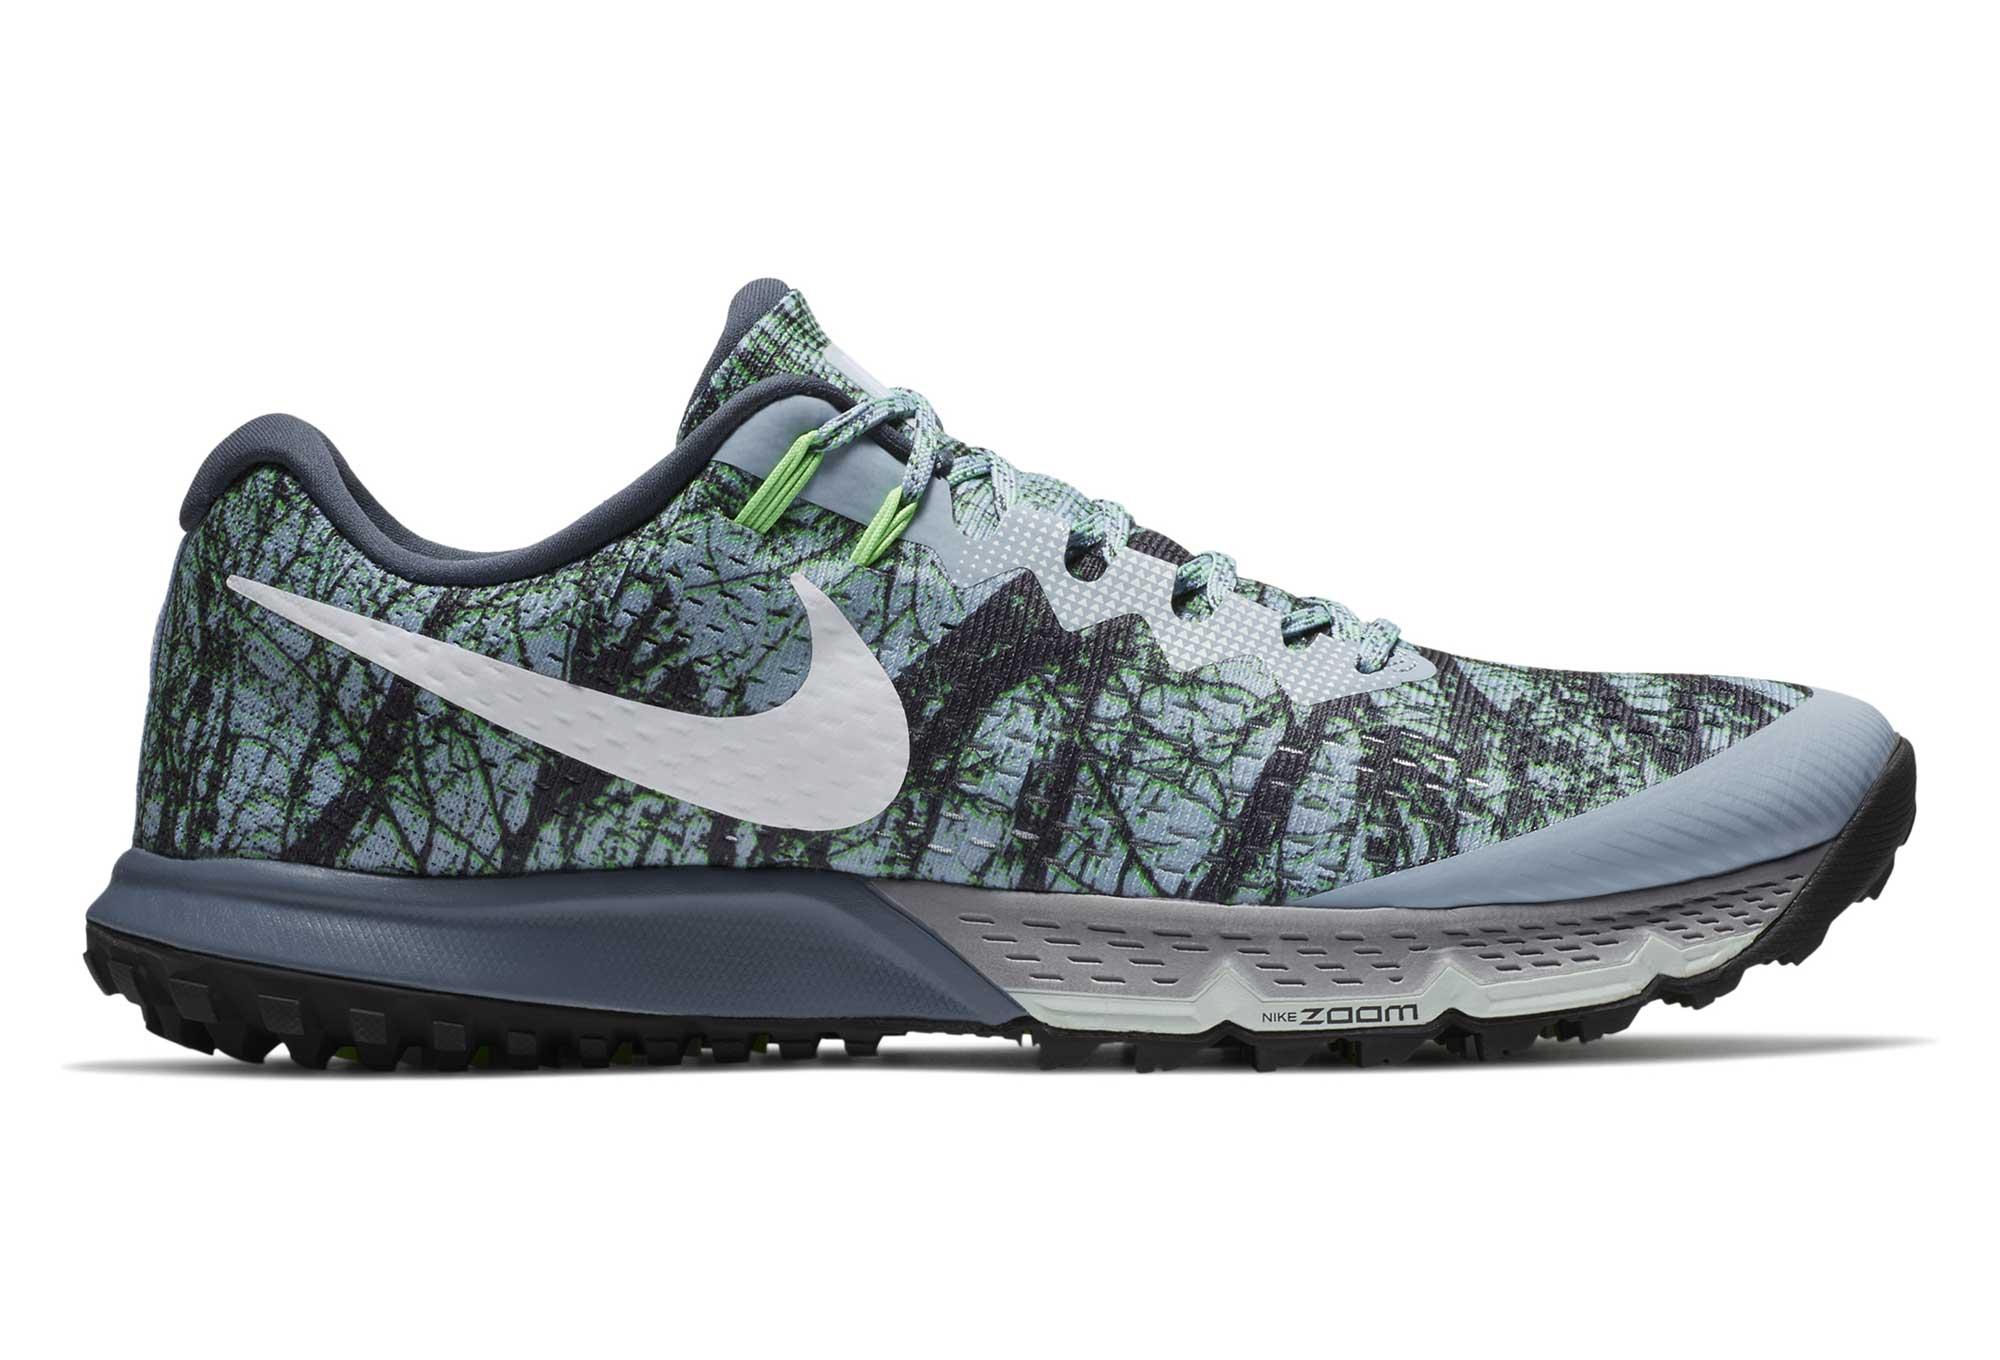 new arrivals 71d72 47ed4 Chaussures de Trail Nike Air Zoom Terra Kiger 4 Gris